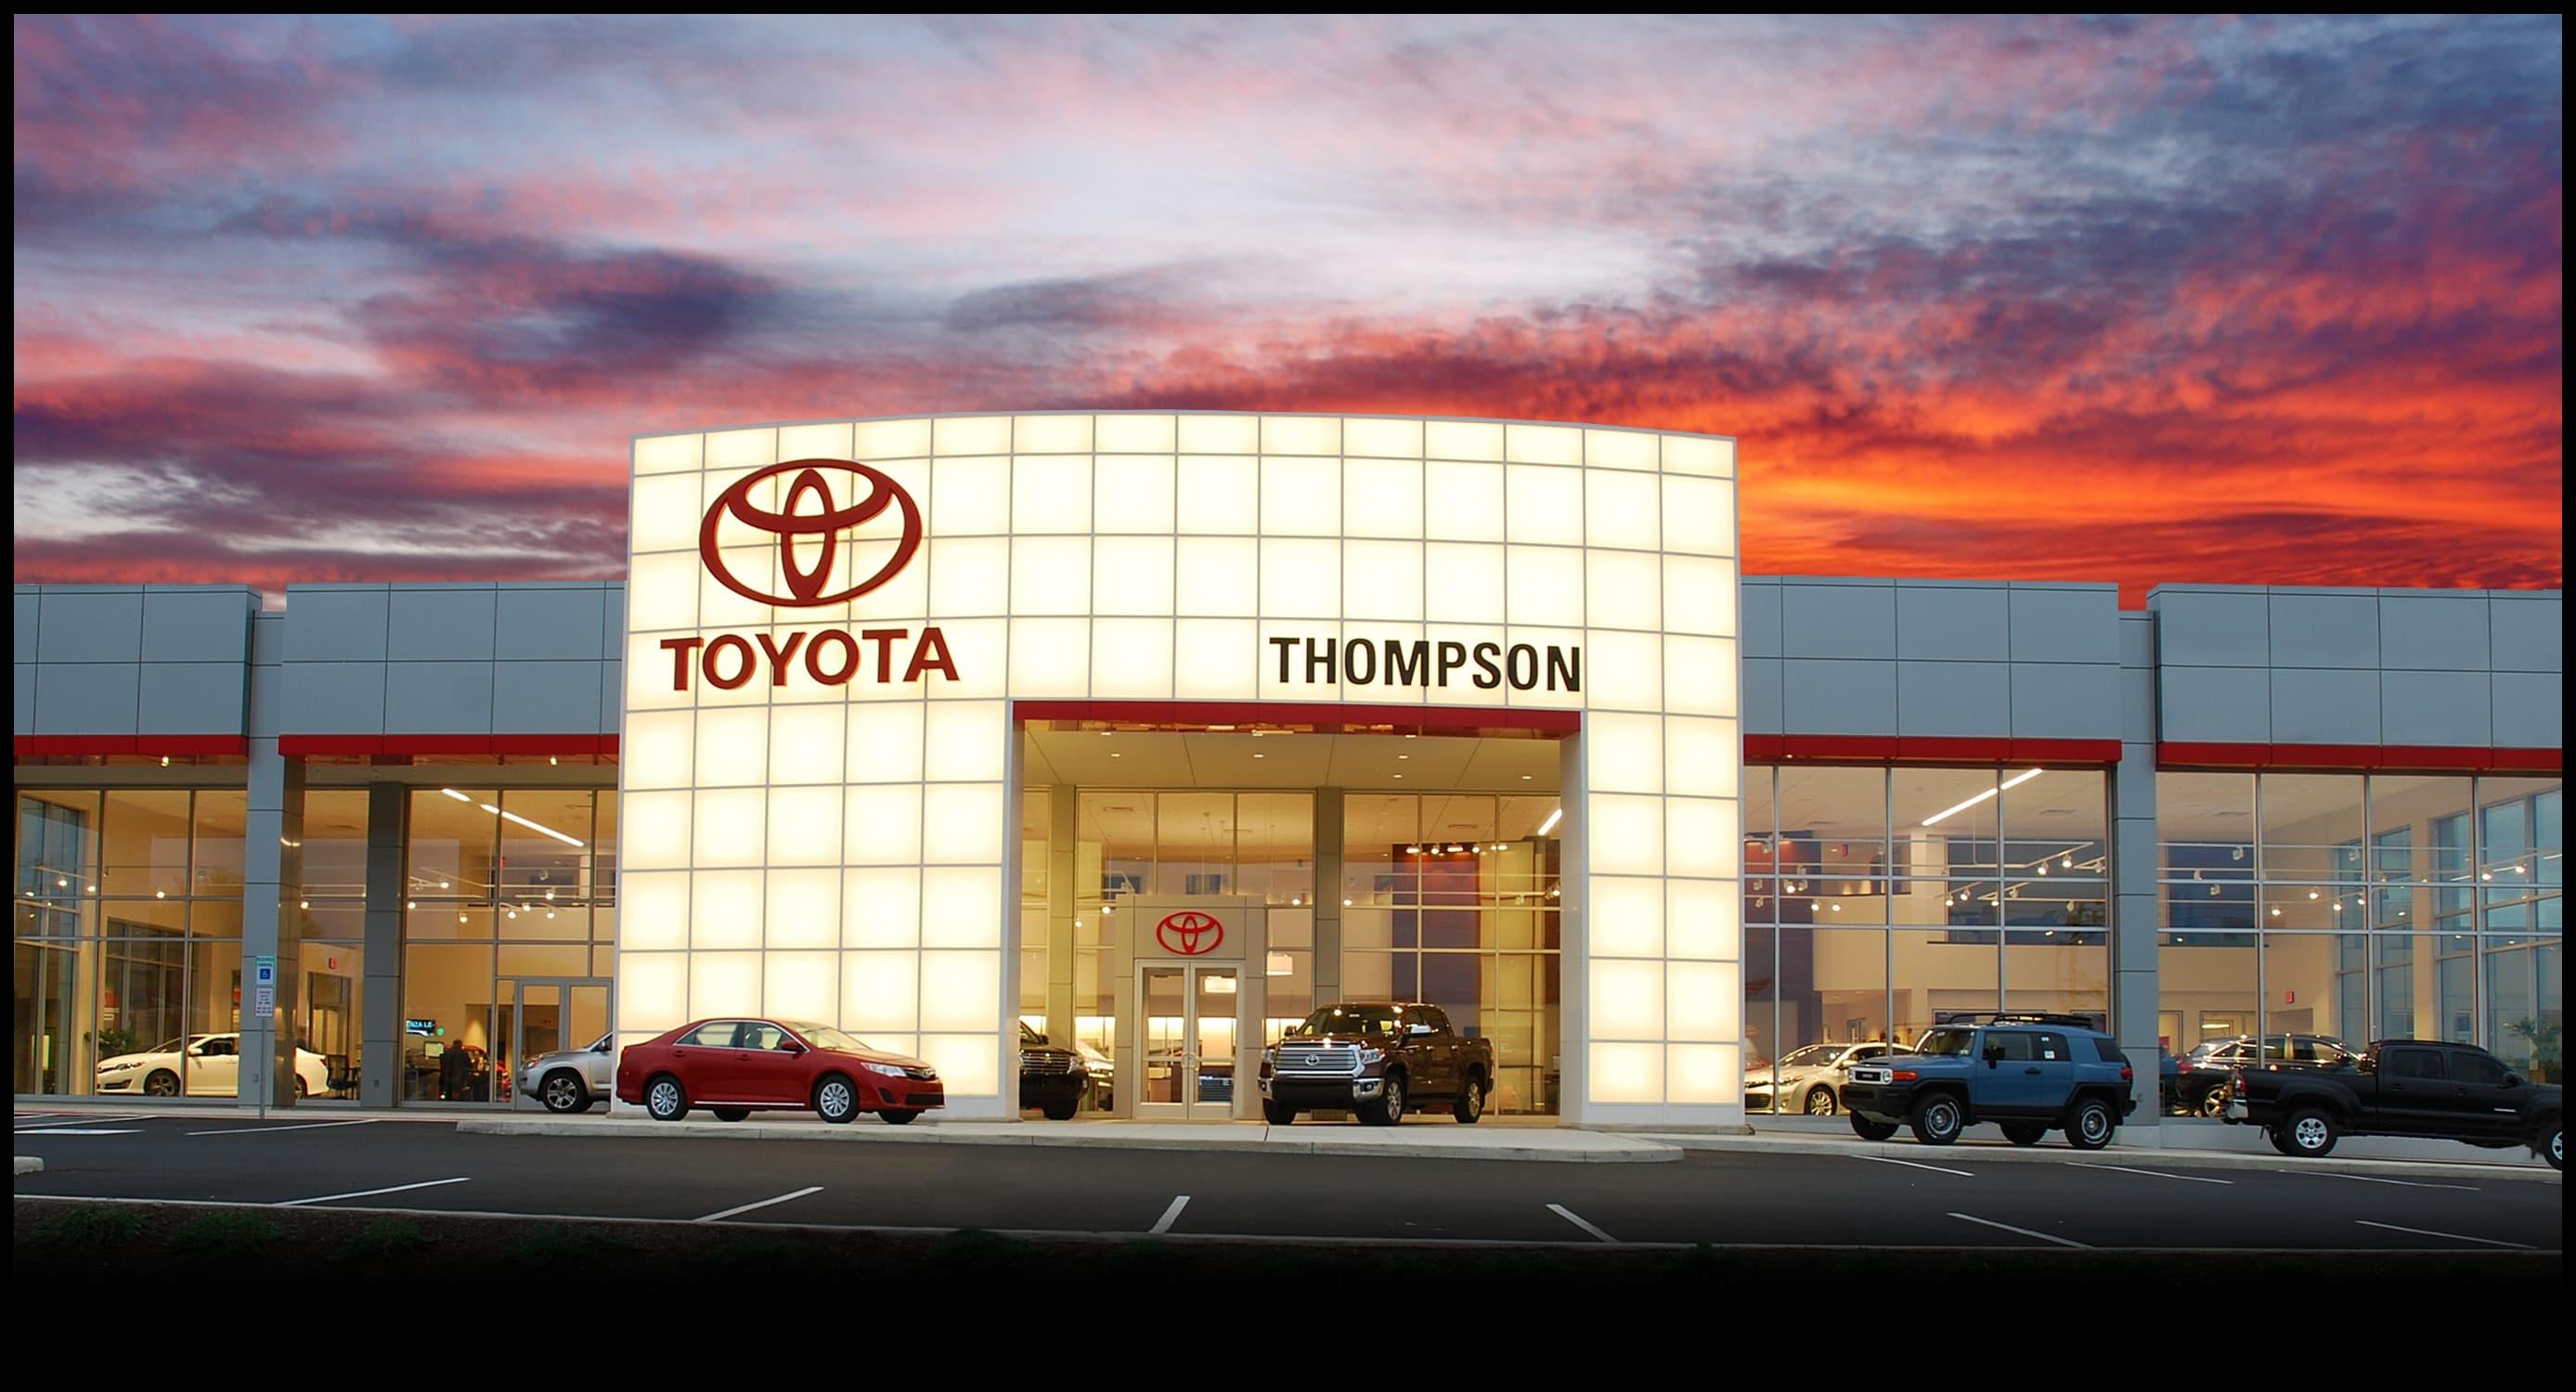 About Thompson Toyota of Doylestown PA